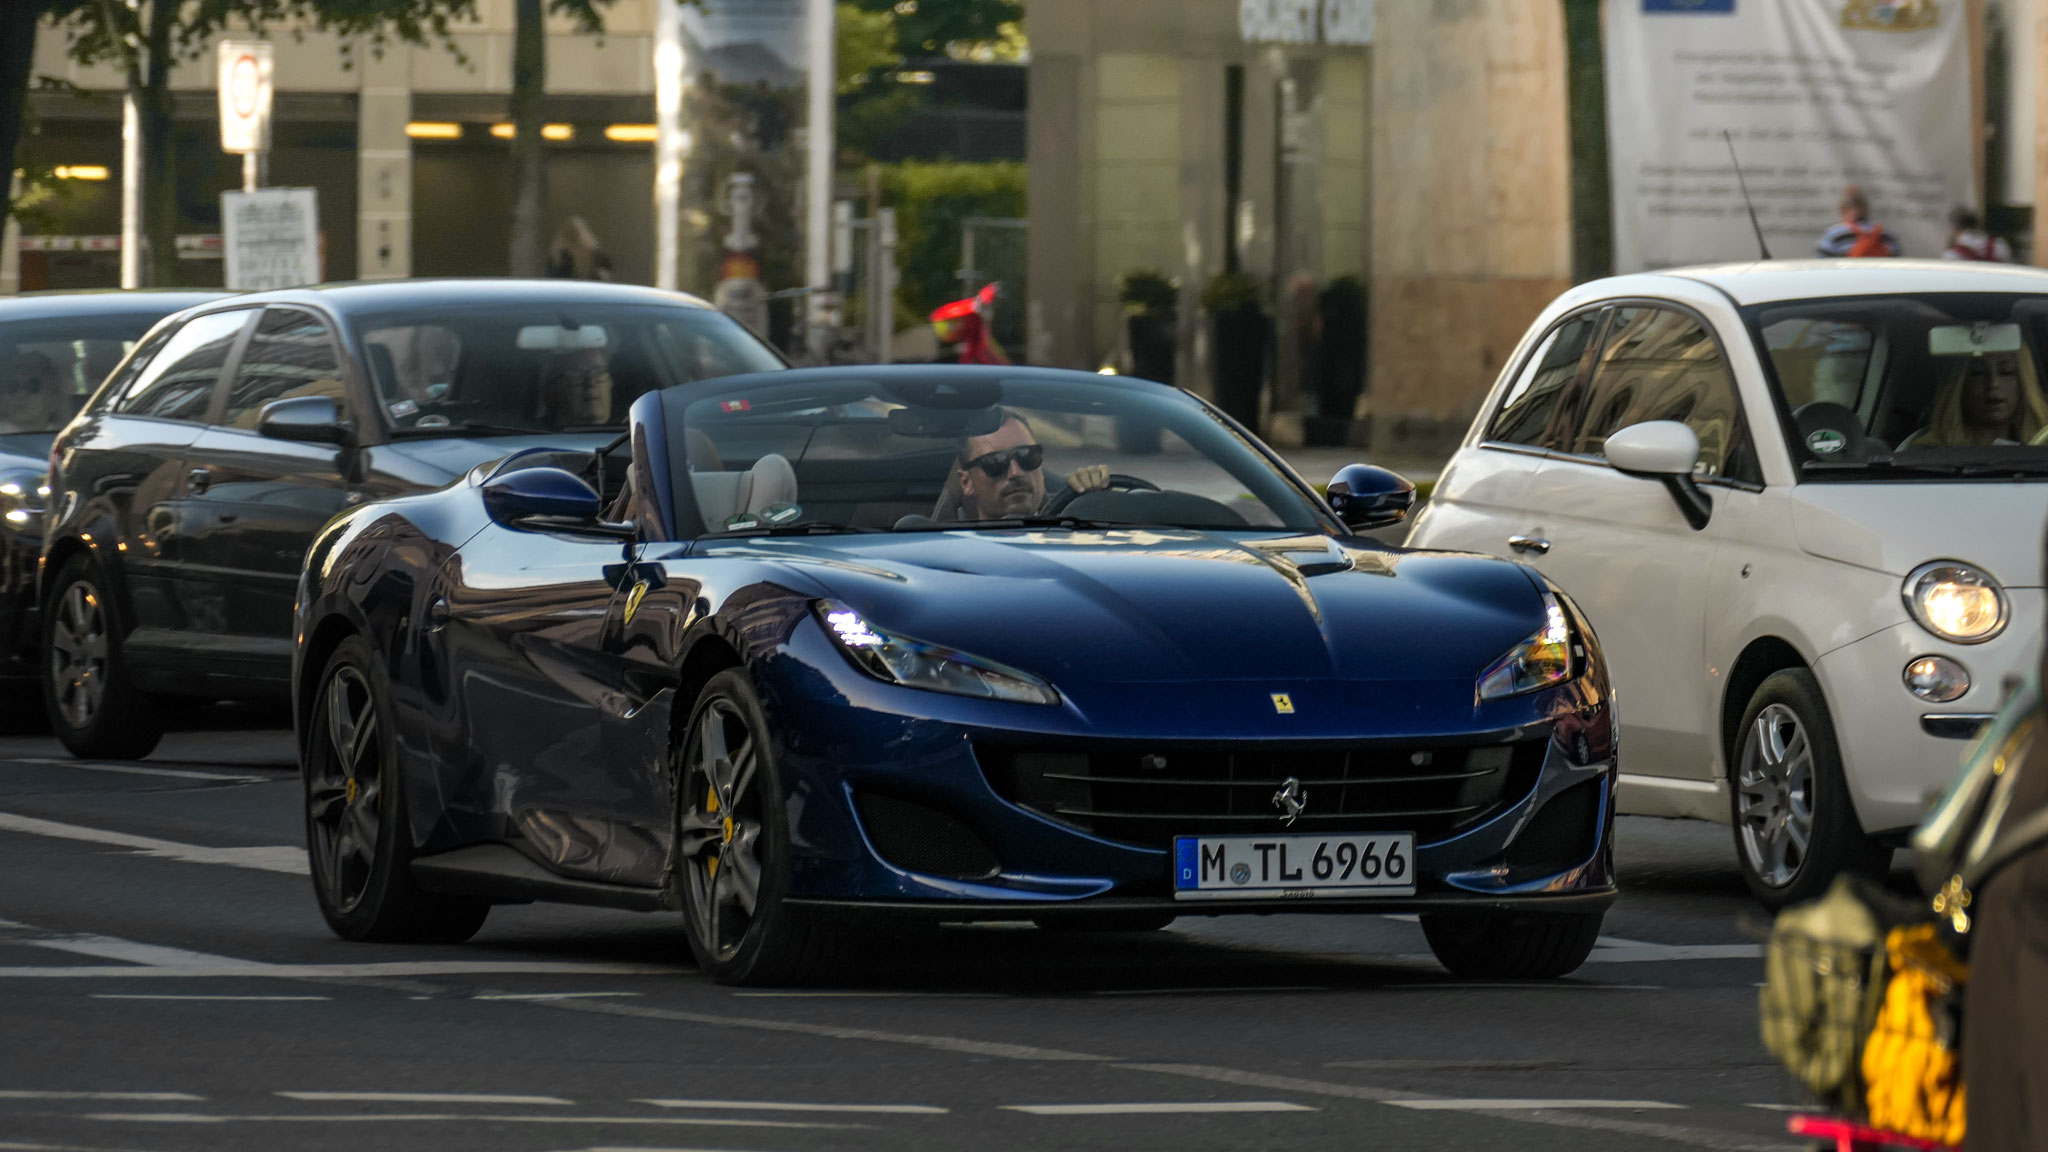 Ferrari Portofino - M-TL-6966